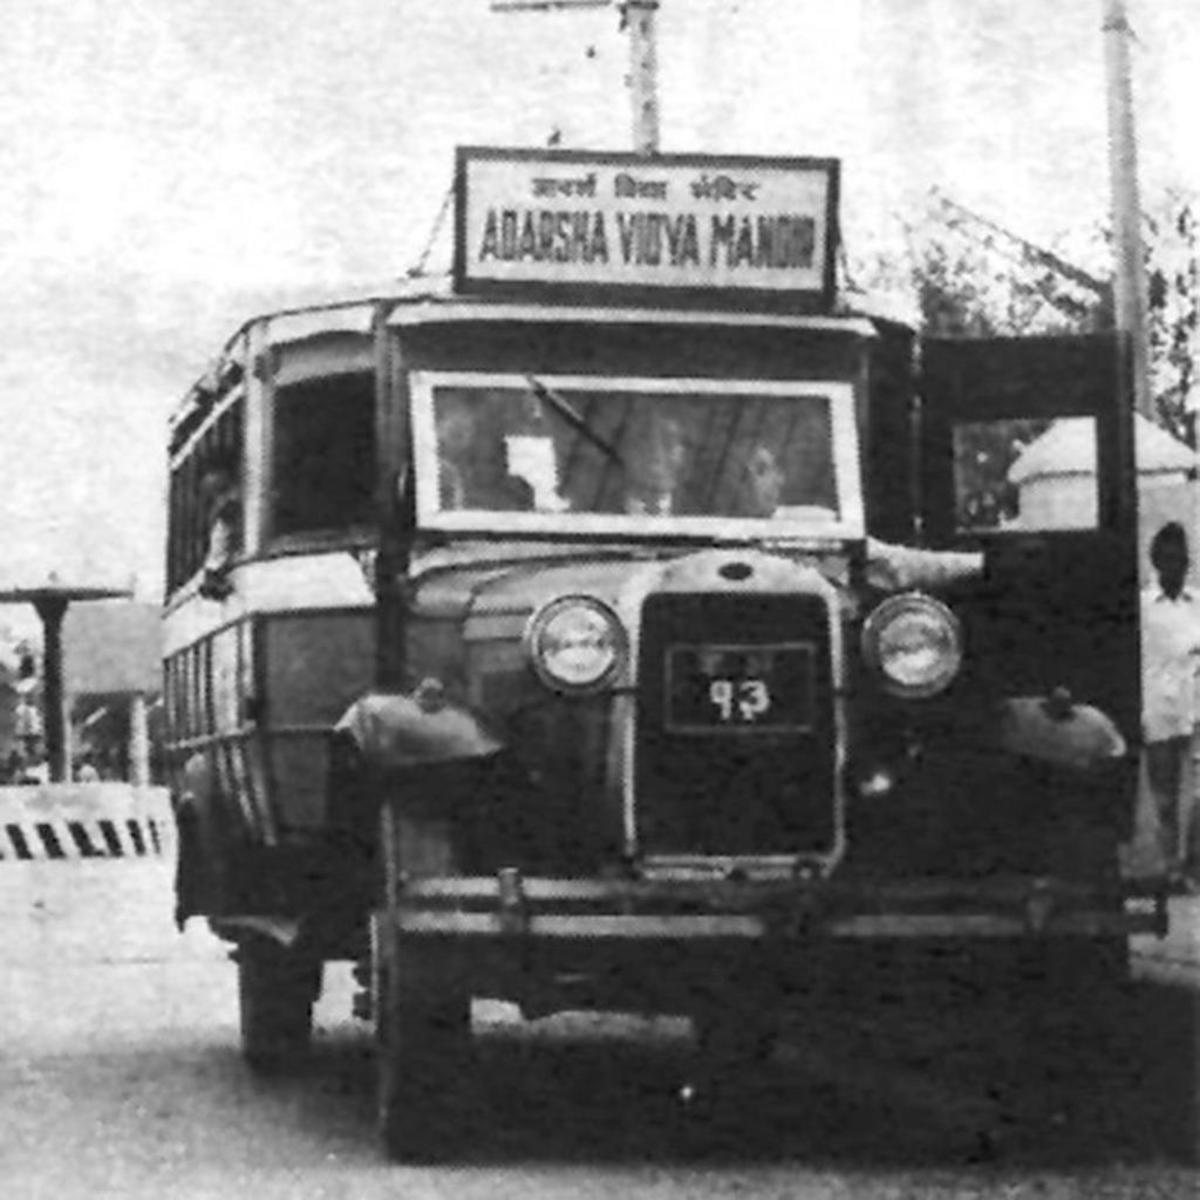 Vintage Ford school bus.